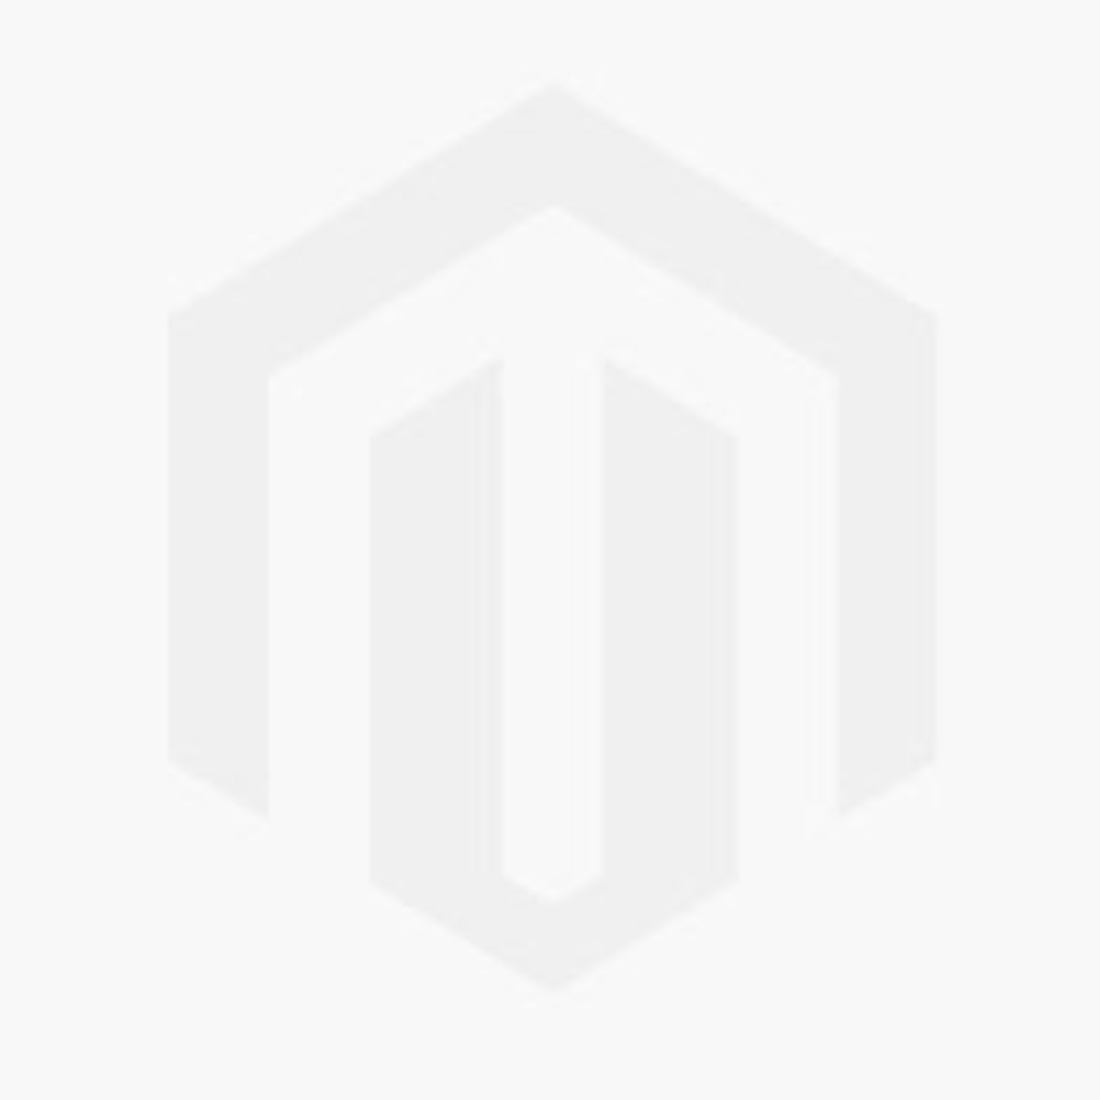 Albert Irvin OBE RA Untitled opus w.41